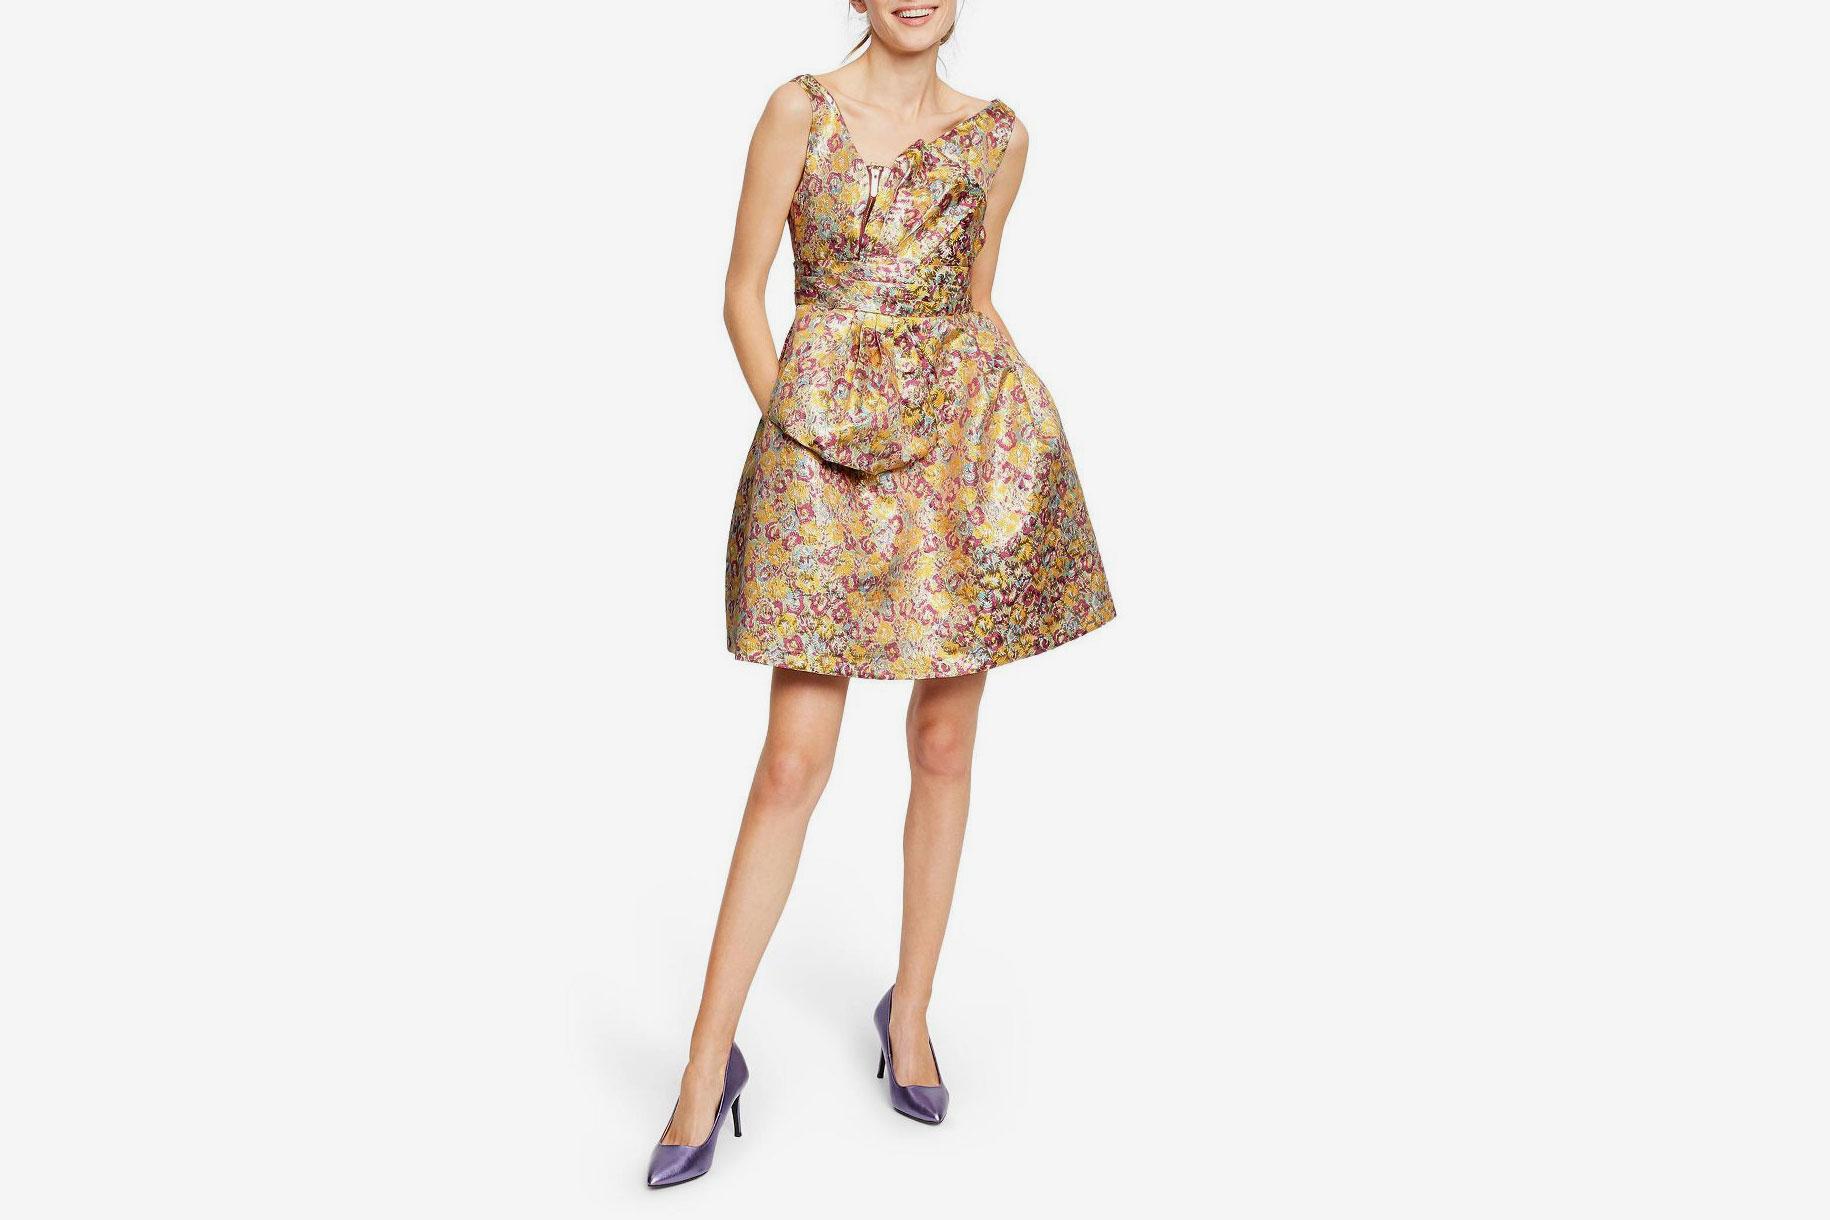 Zac Posen for Target Floral Print Sleeveless Brocade Mini Dress